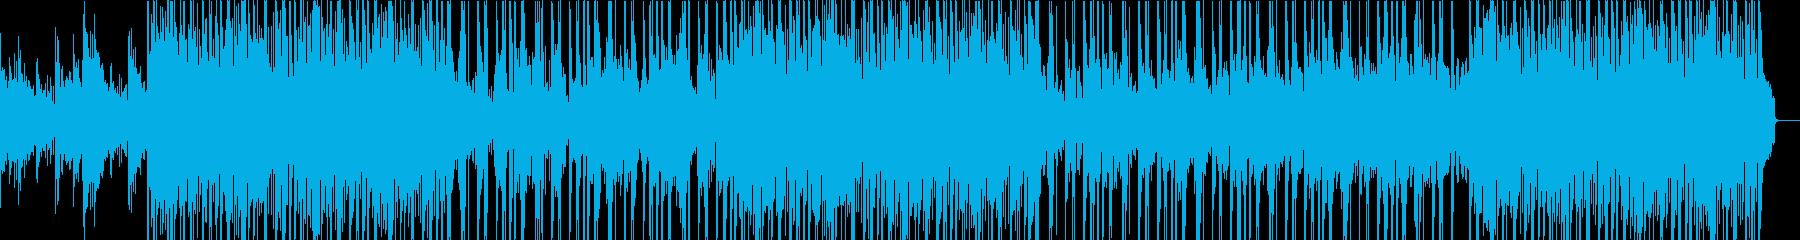 R&B/英語/女性ボーカル/洋楽の再生済みの波形